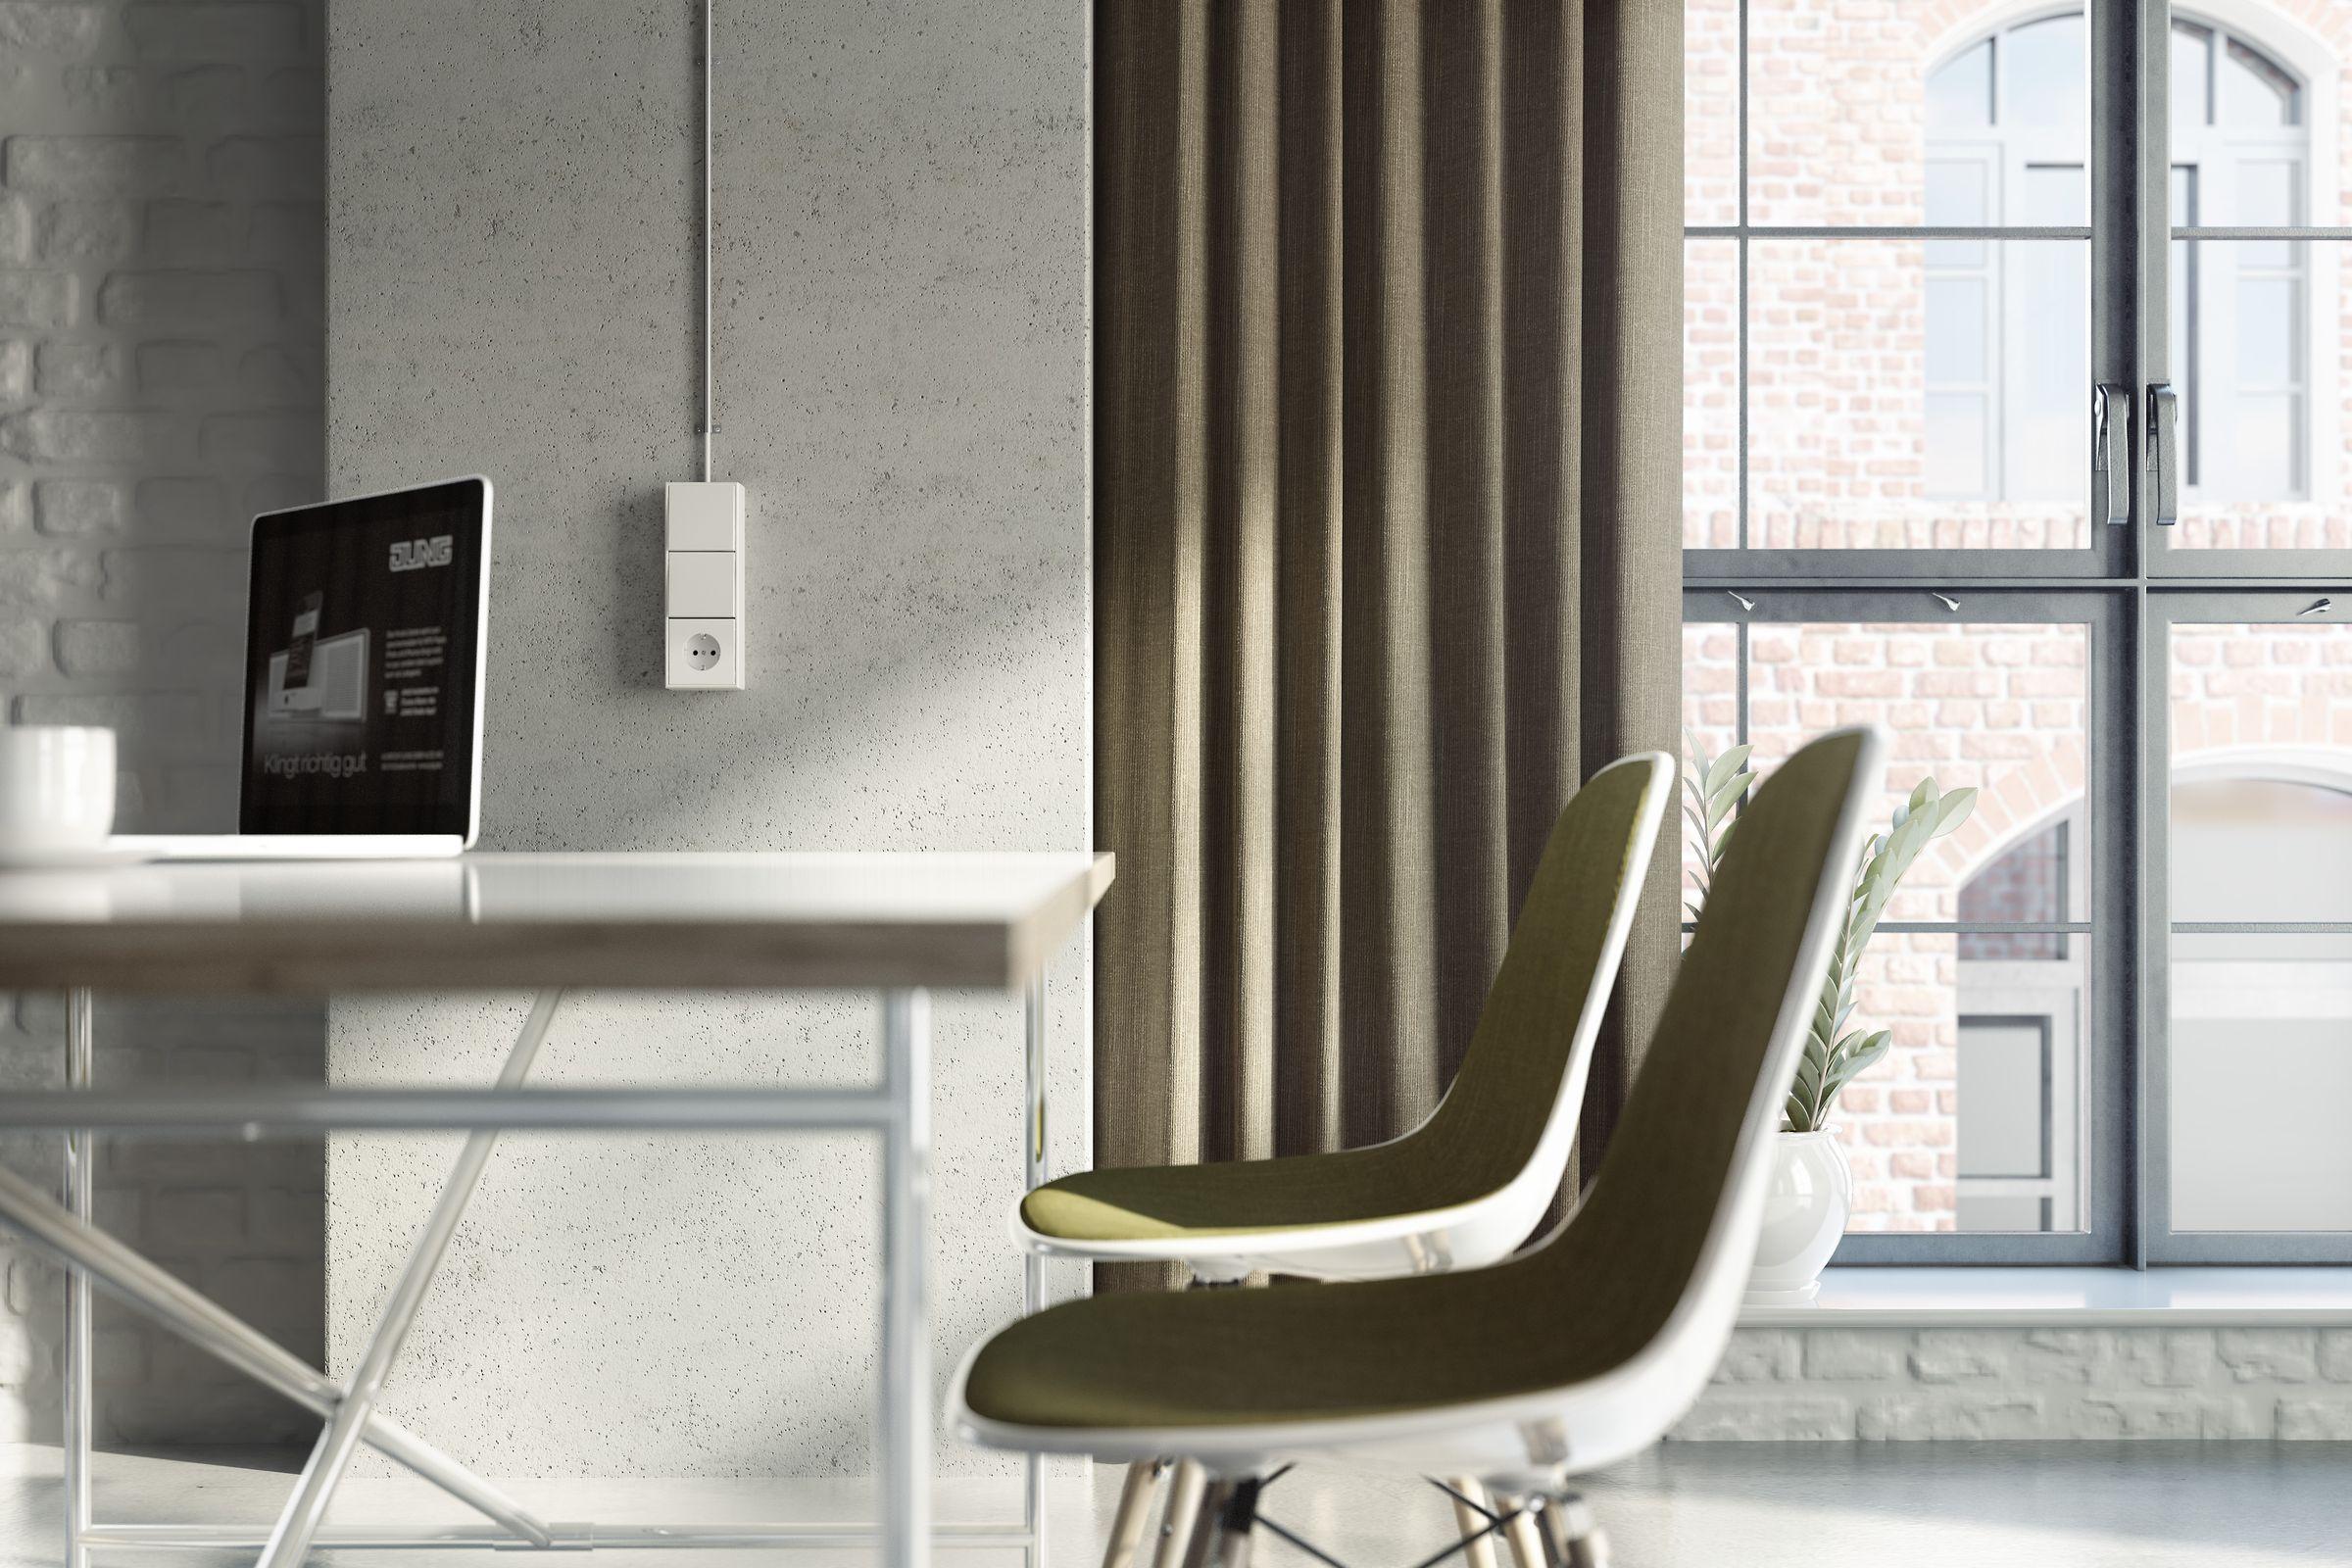 Jung_Light_Building_2012_Renderings ### jung_light_building_loft_detail_120613_01